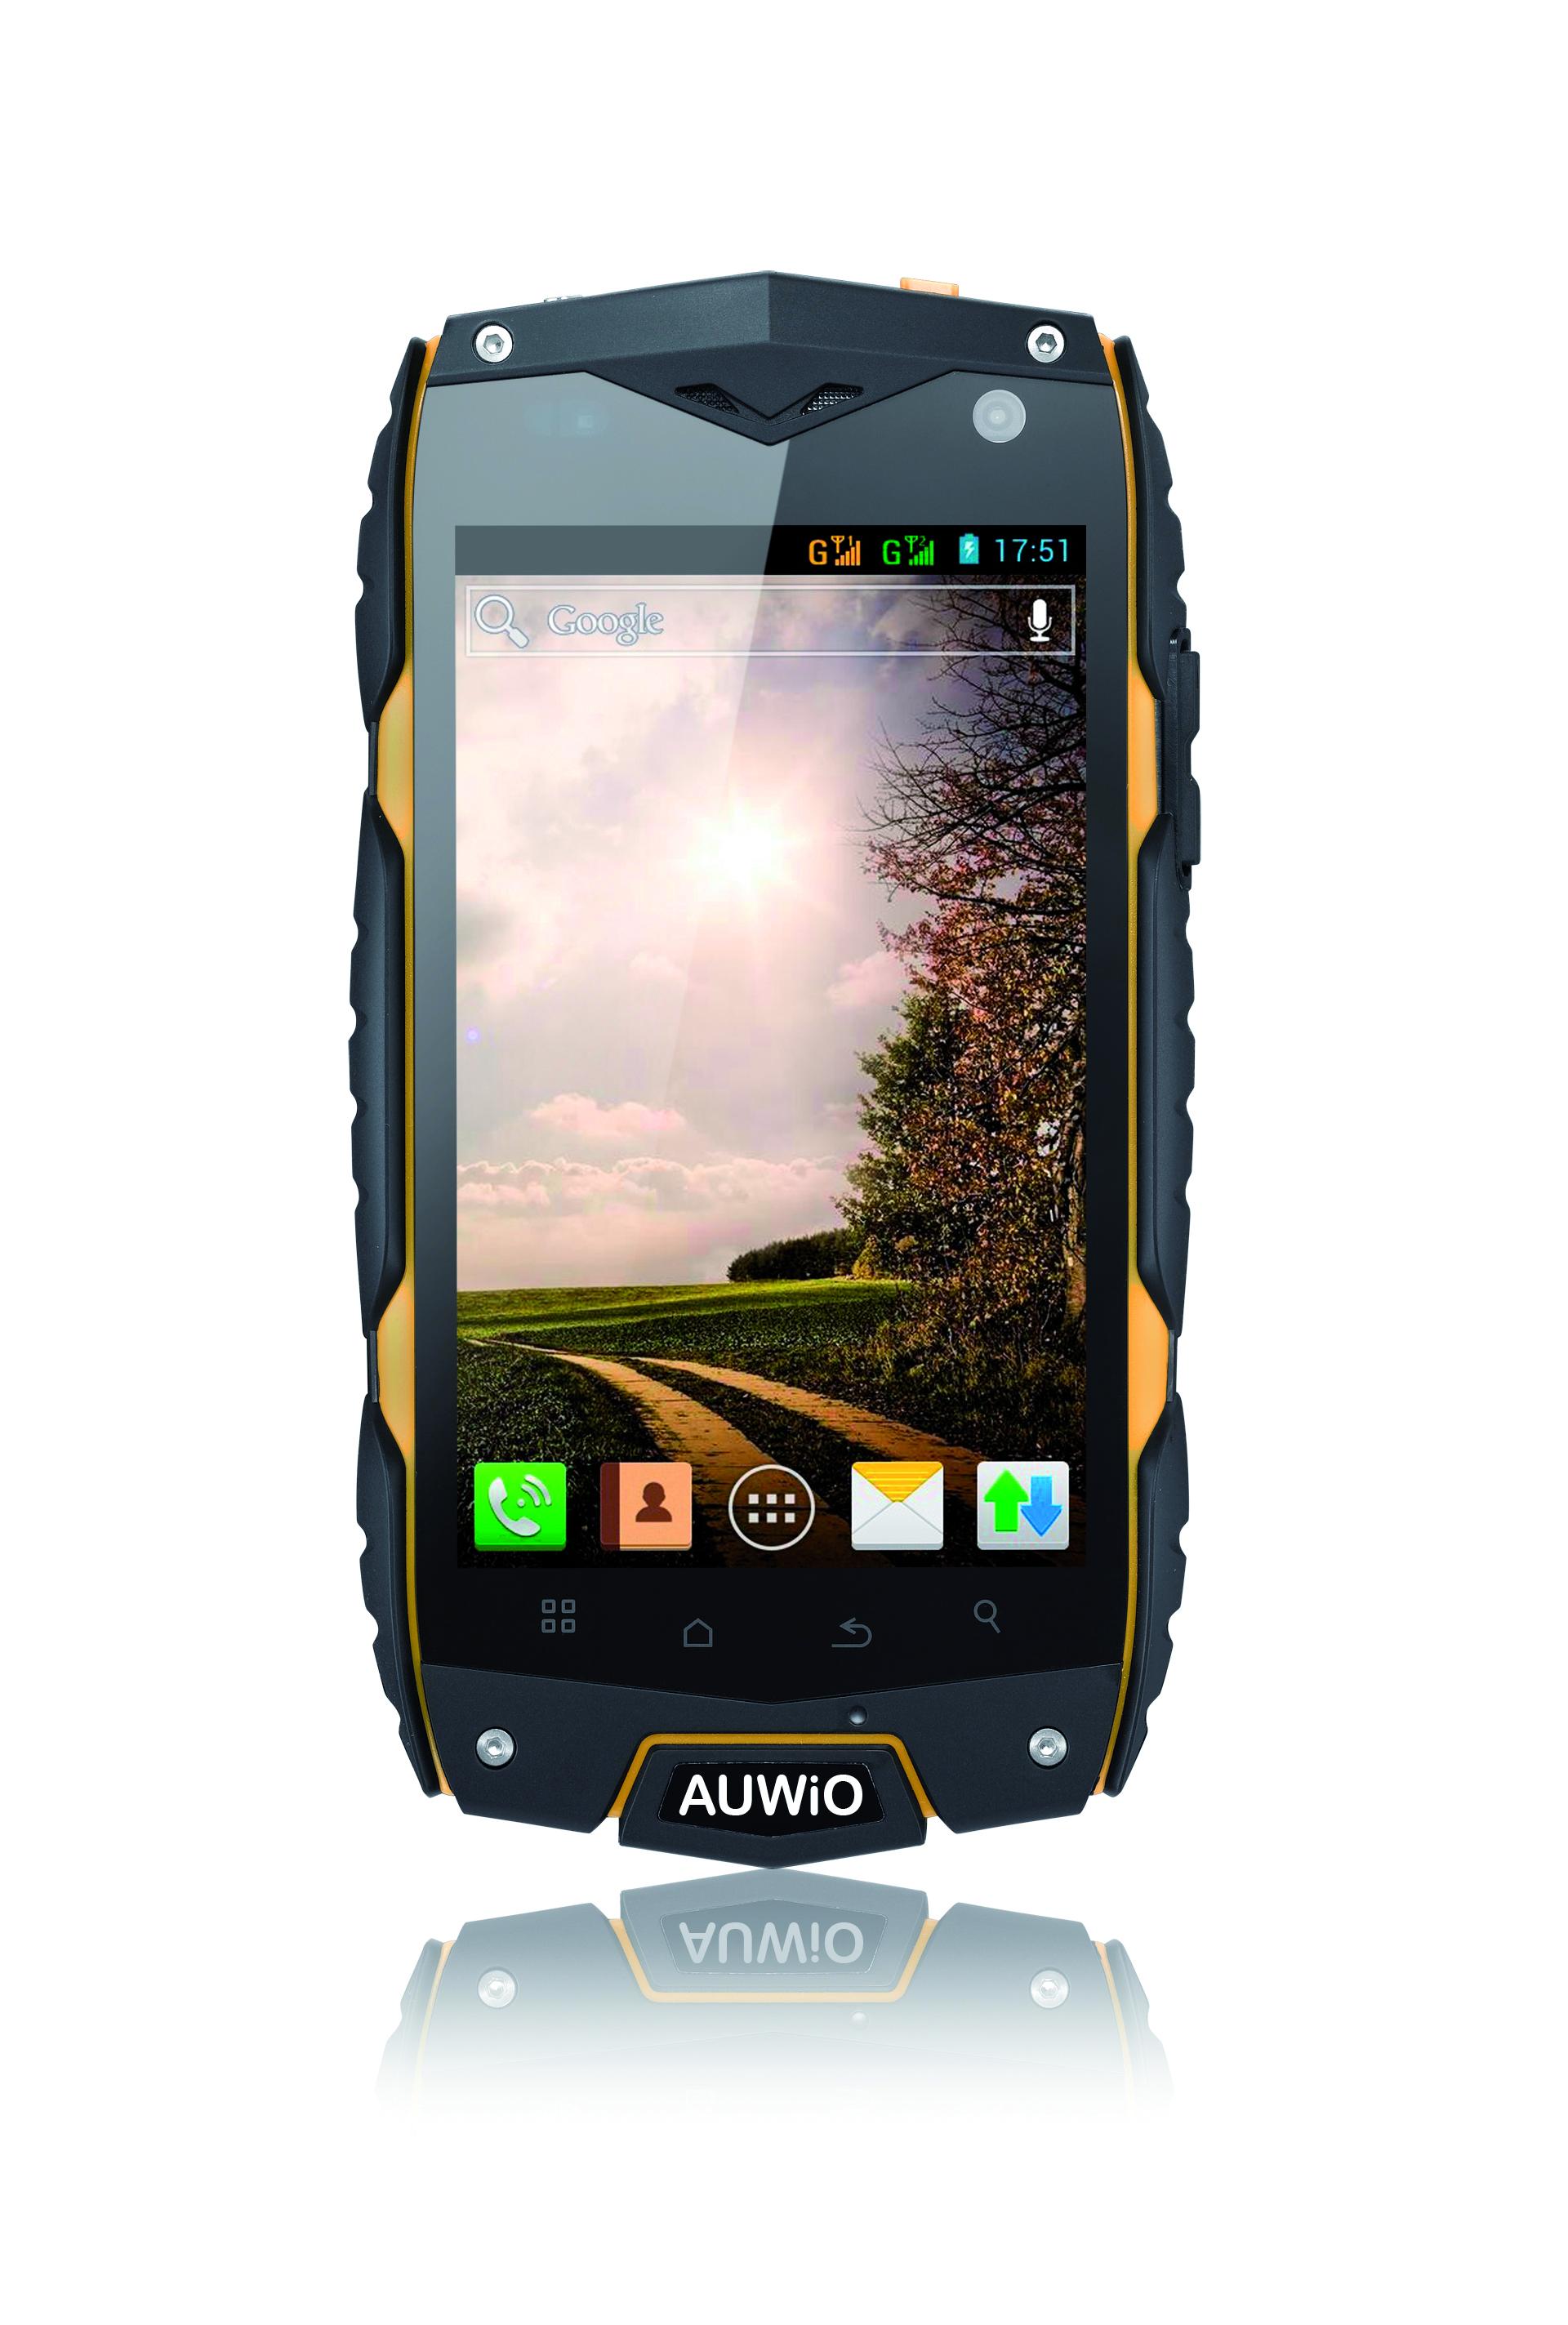 Nouveau smartphone durci Auwio AMX-200